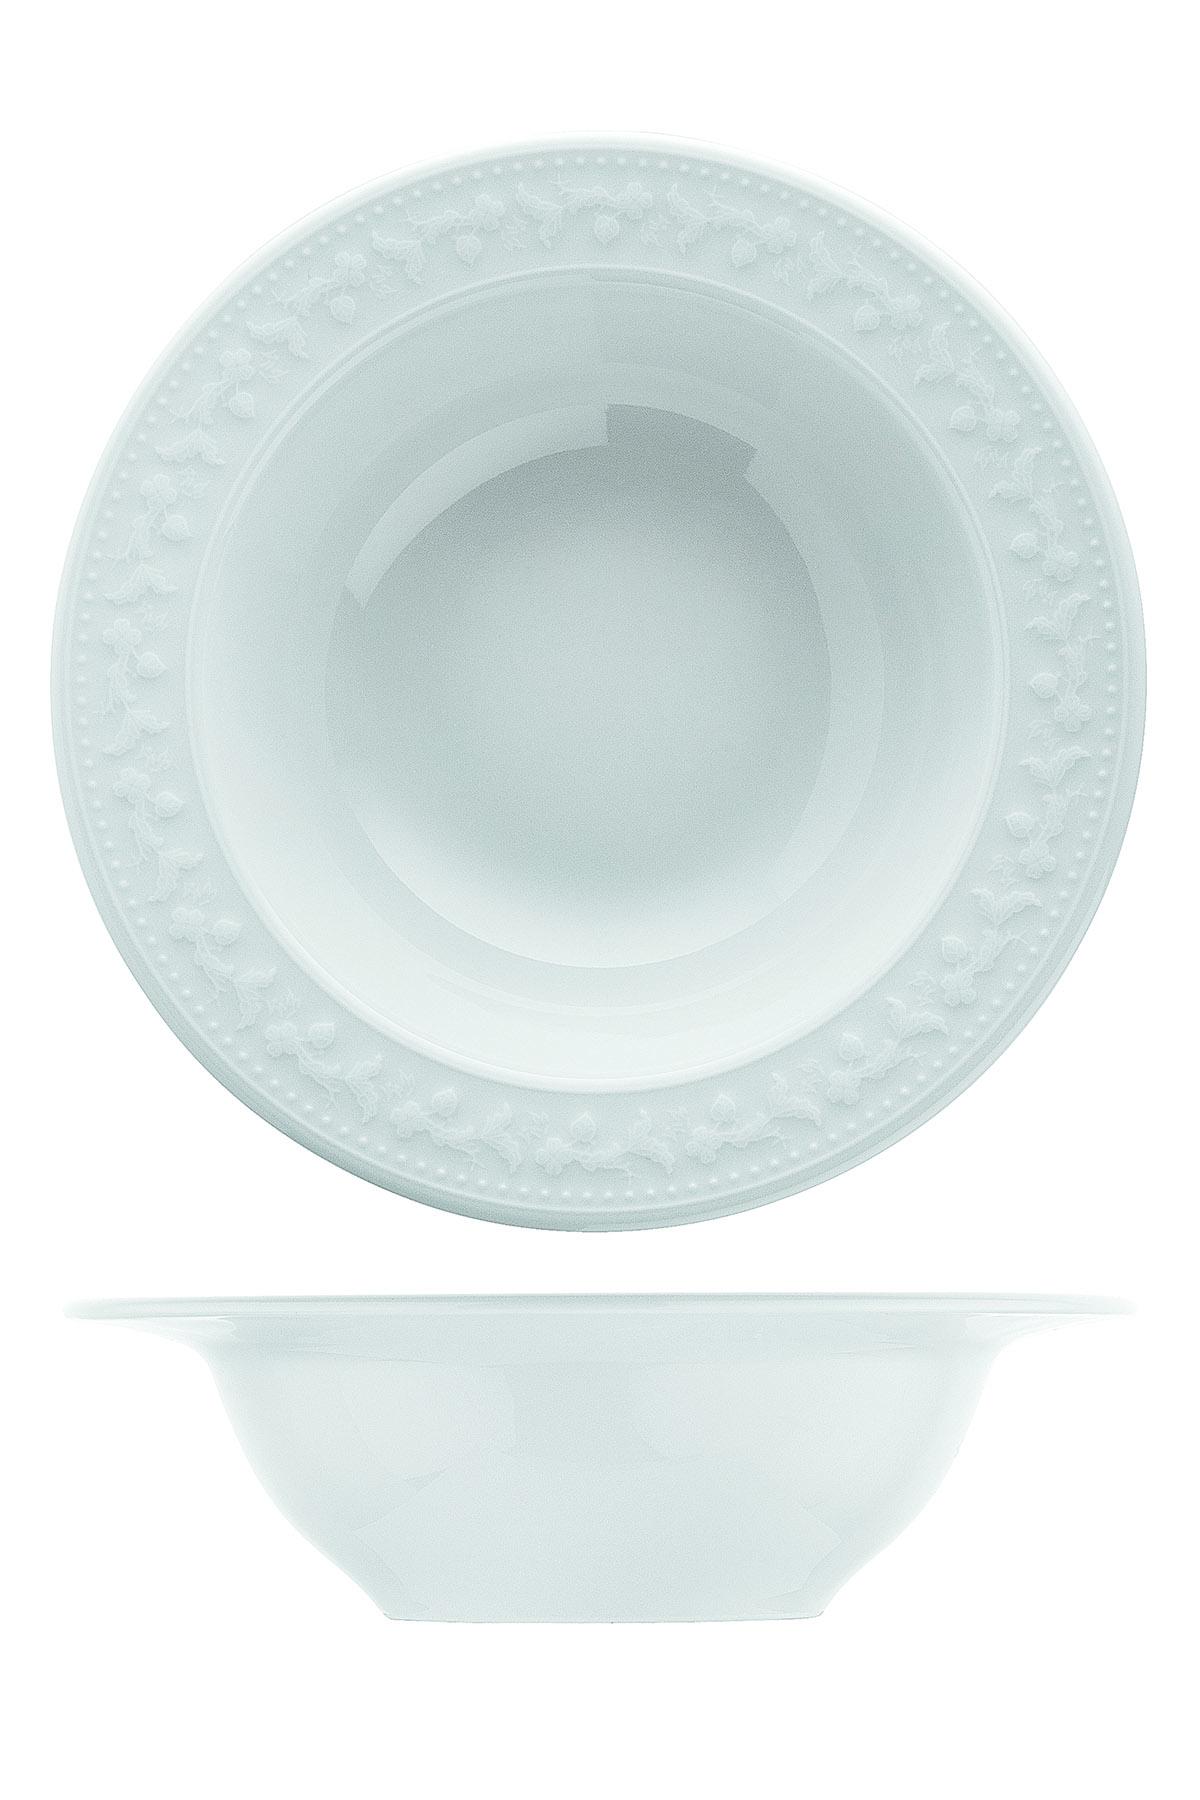 Kütahya Porselen - Kütahya Porselen Silvia 24 Parça Yemek Seti (1)